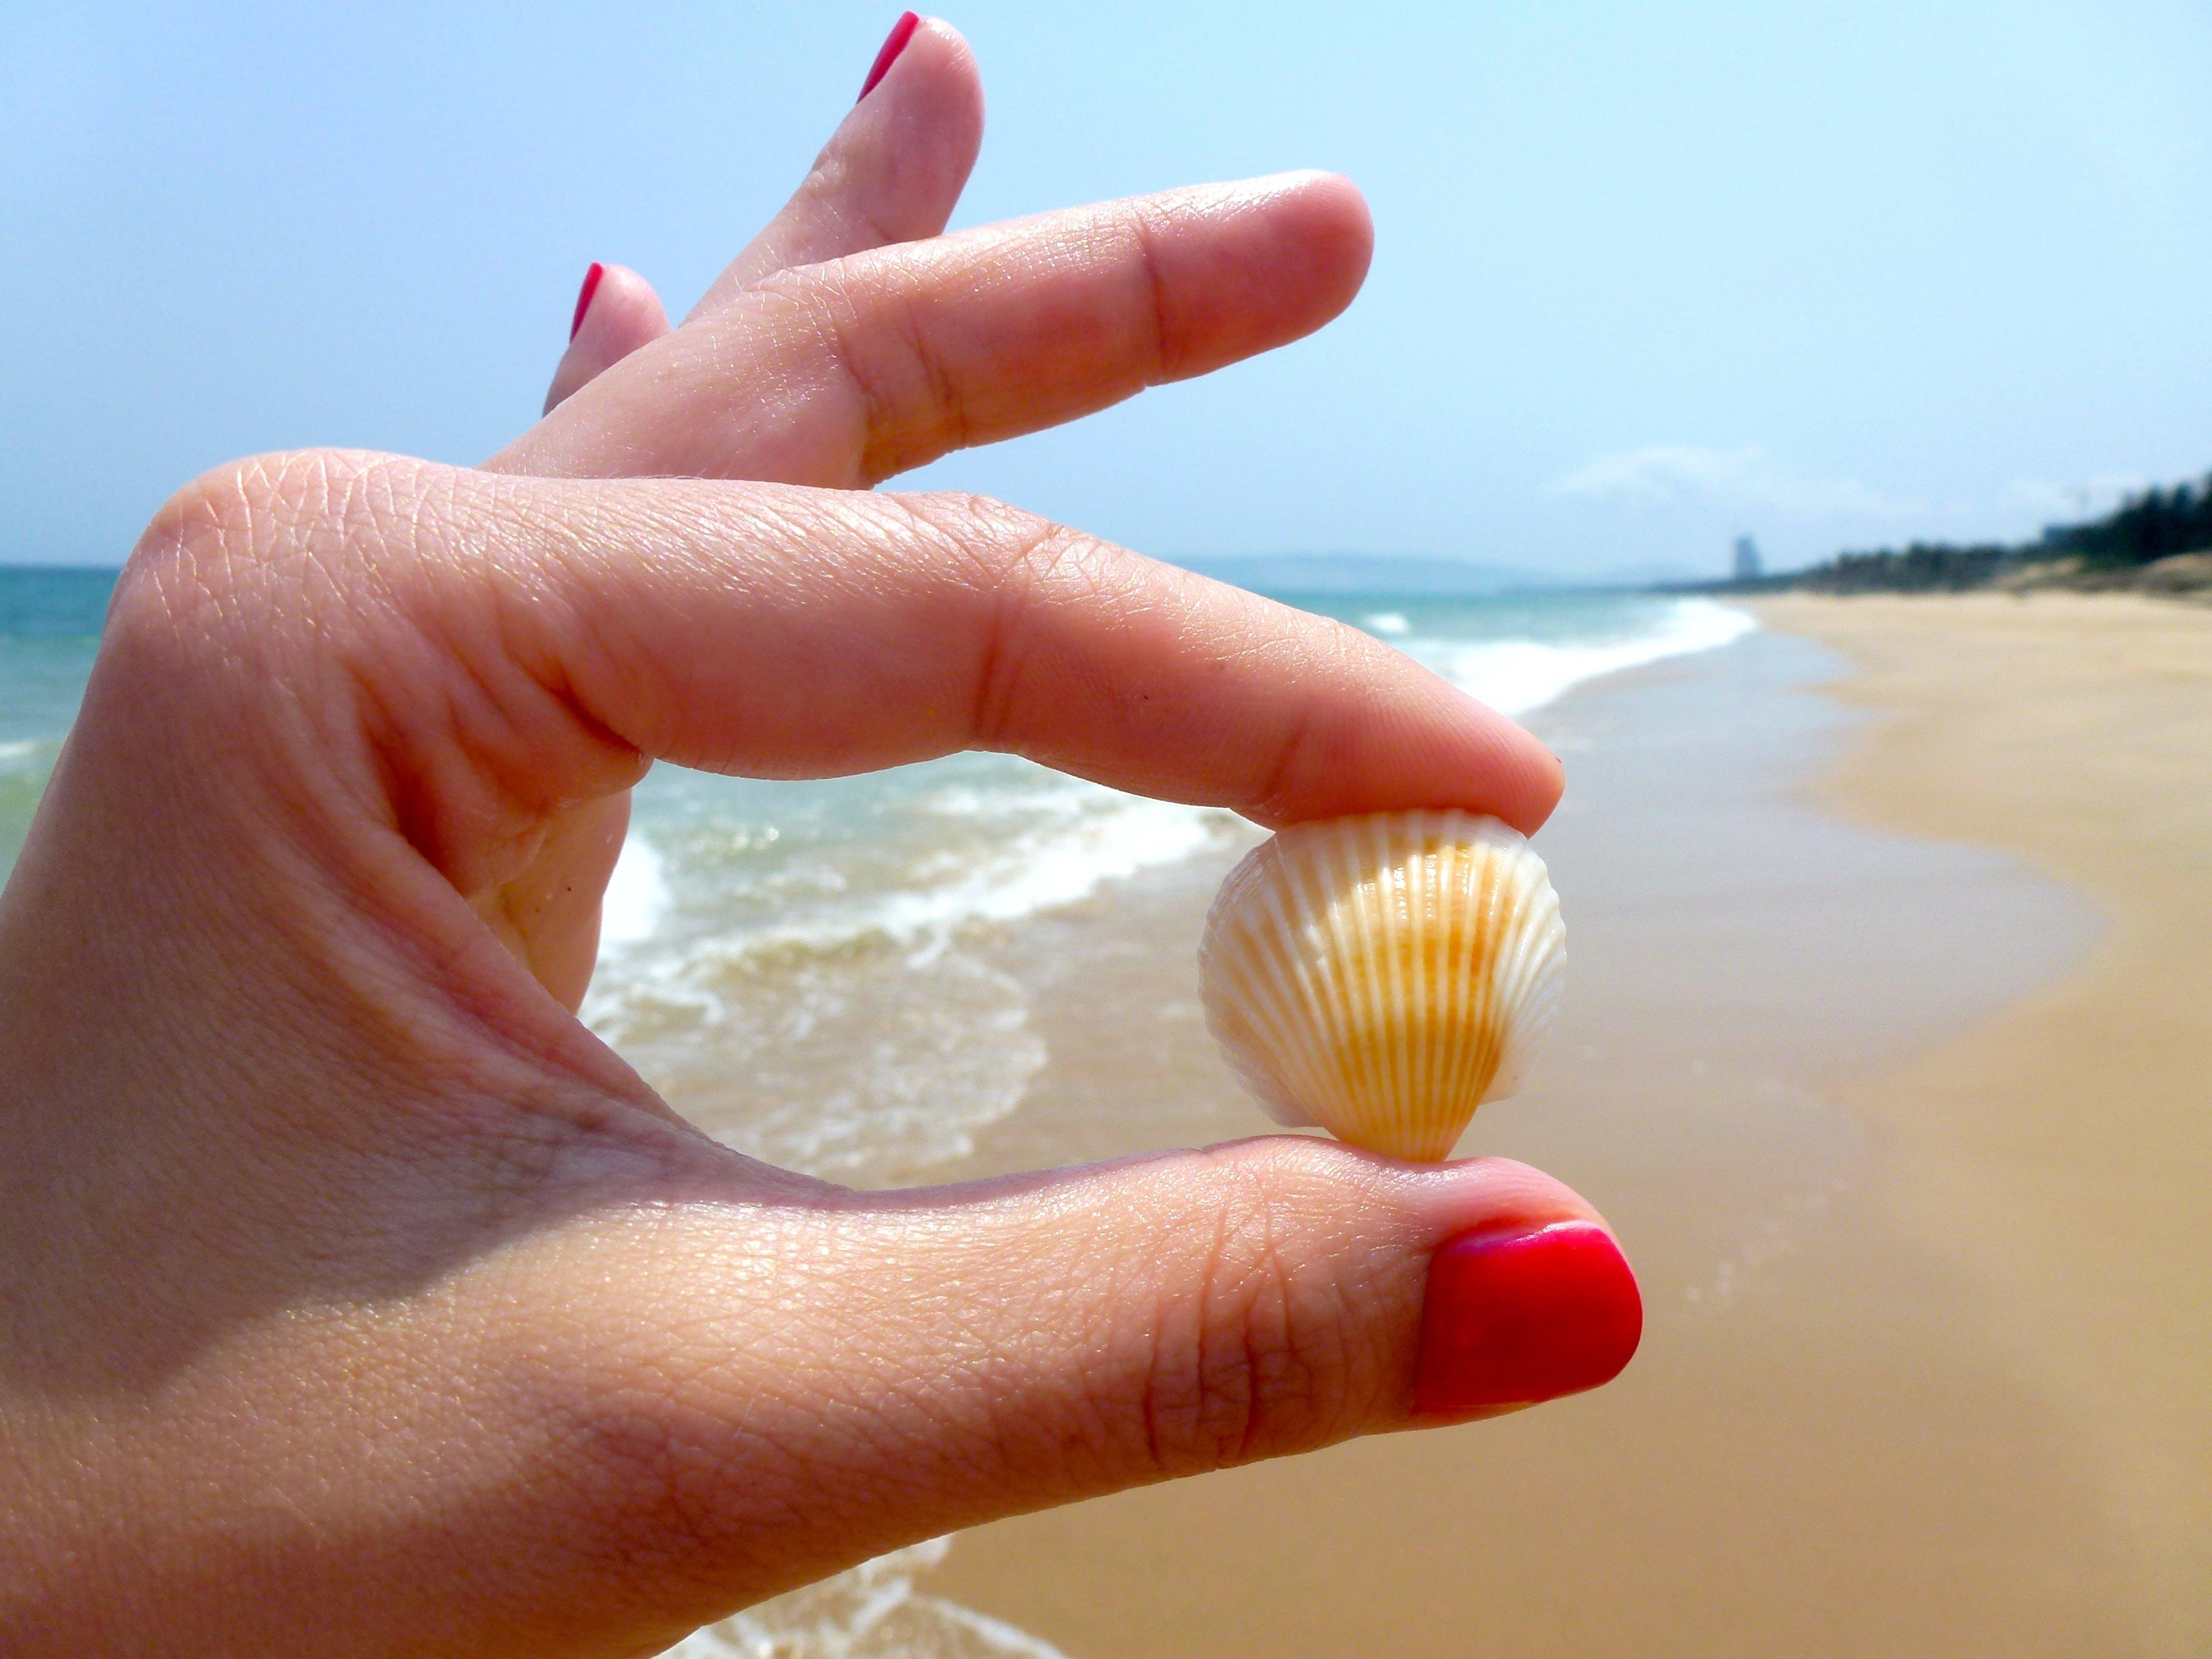 Free stock photo of sea, beach, hands, hand